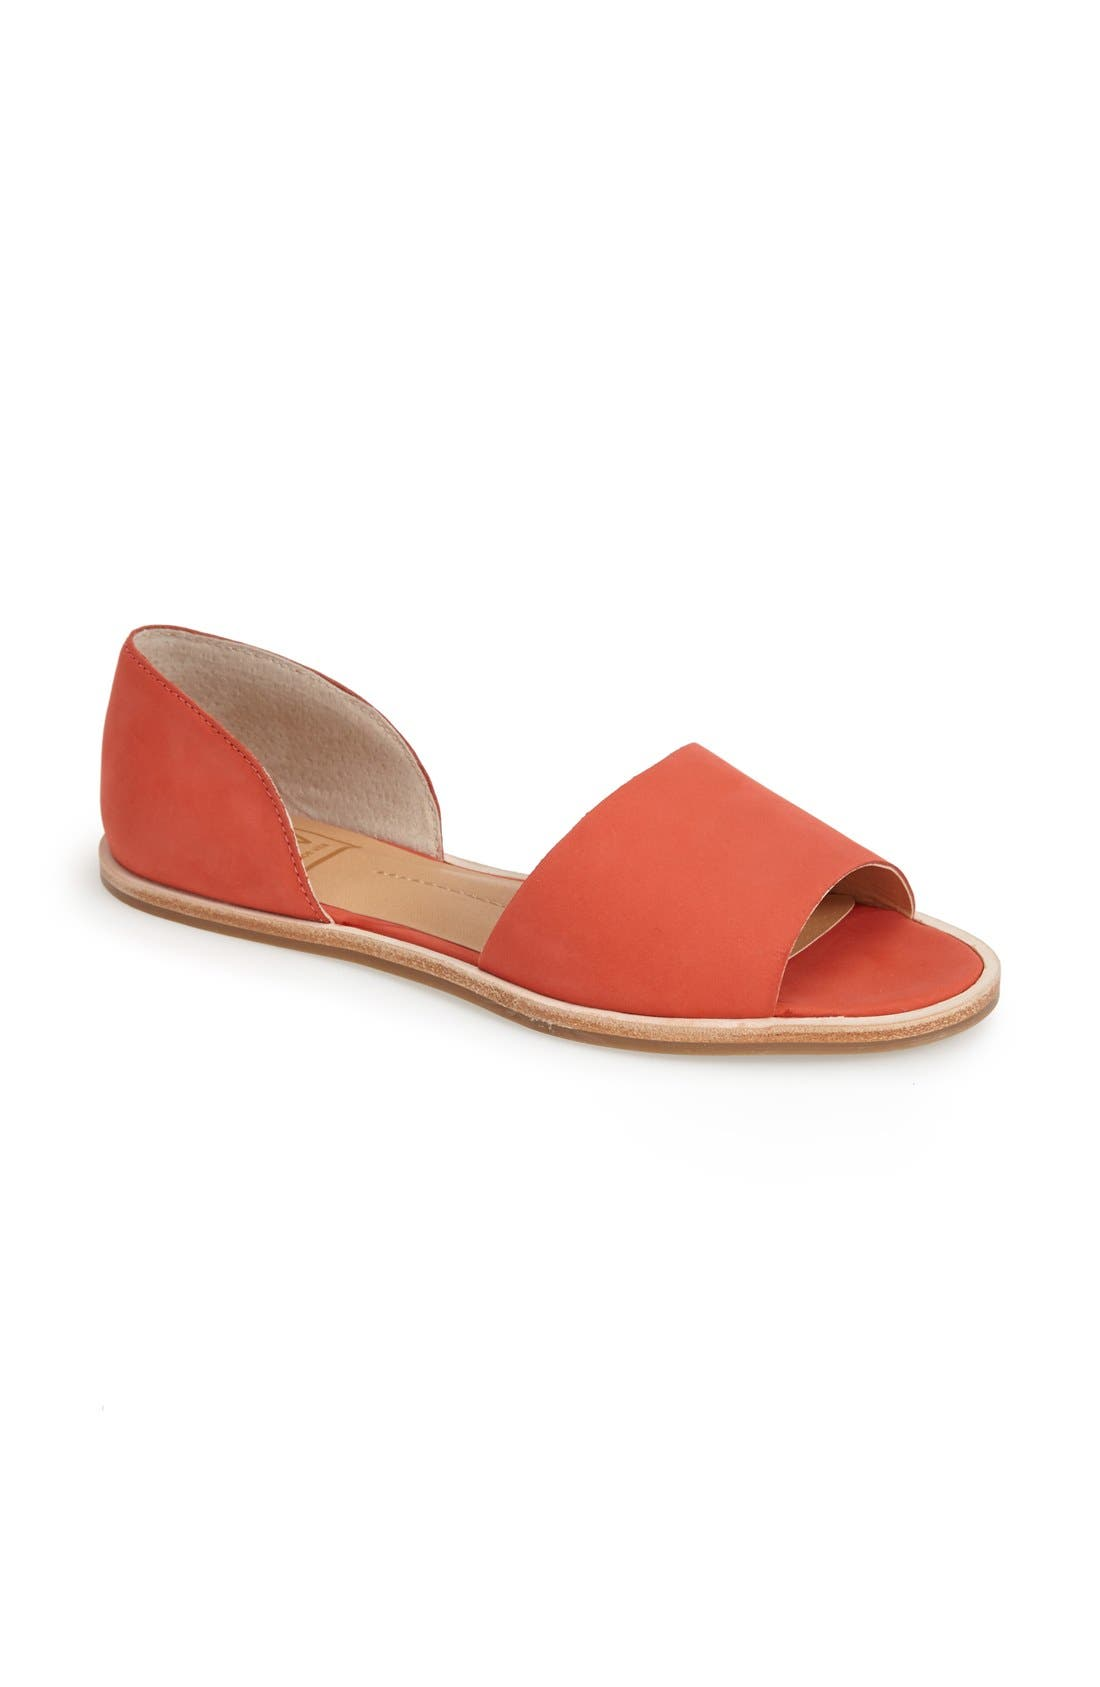 Alternate Image 1 Selected - DV by Dolce Vita 'Datsun' Leather Sandal (Women)